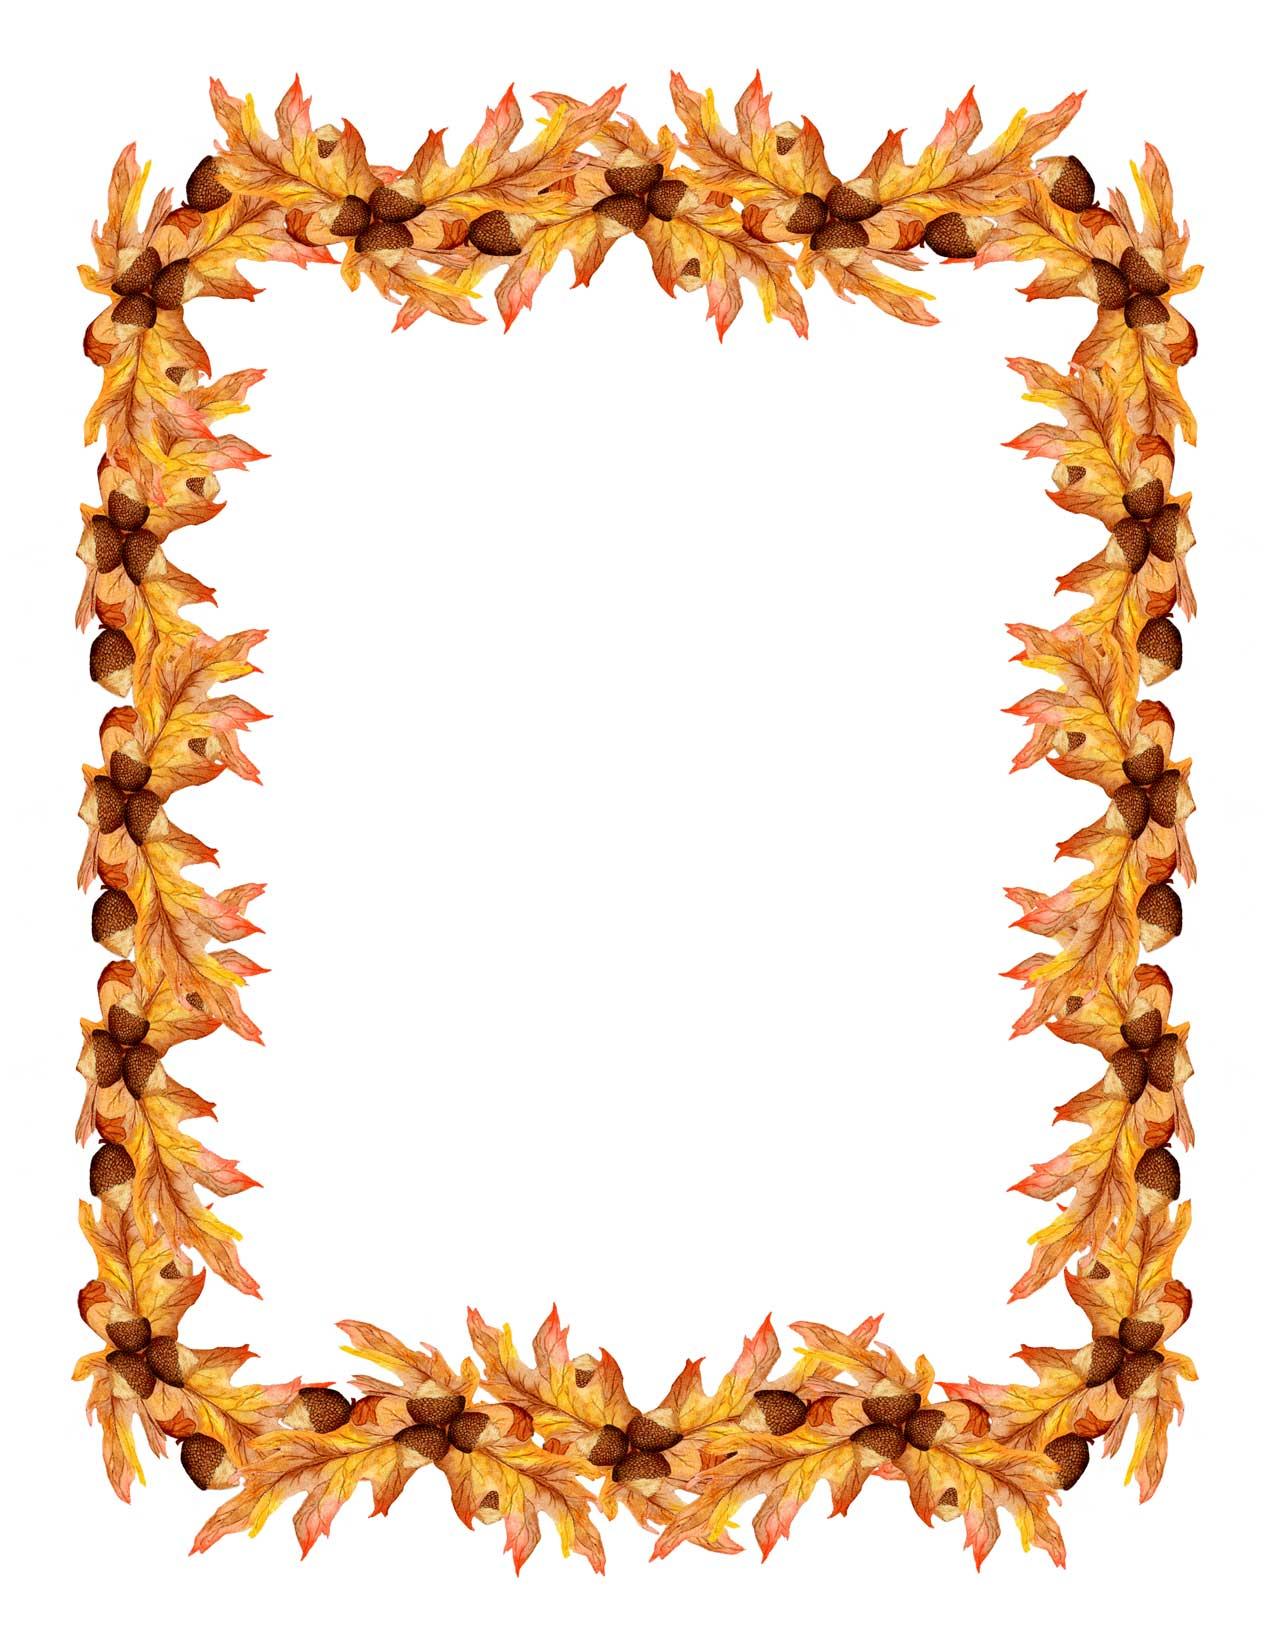 Harvest clipart border. Free fall festival download